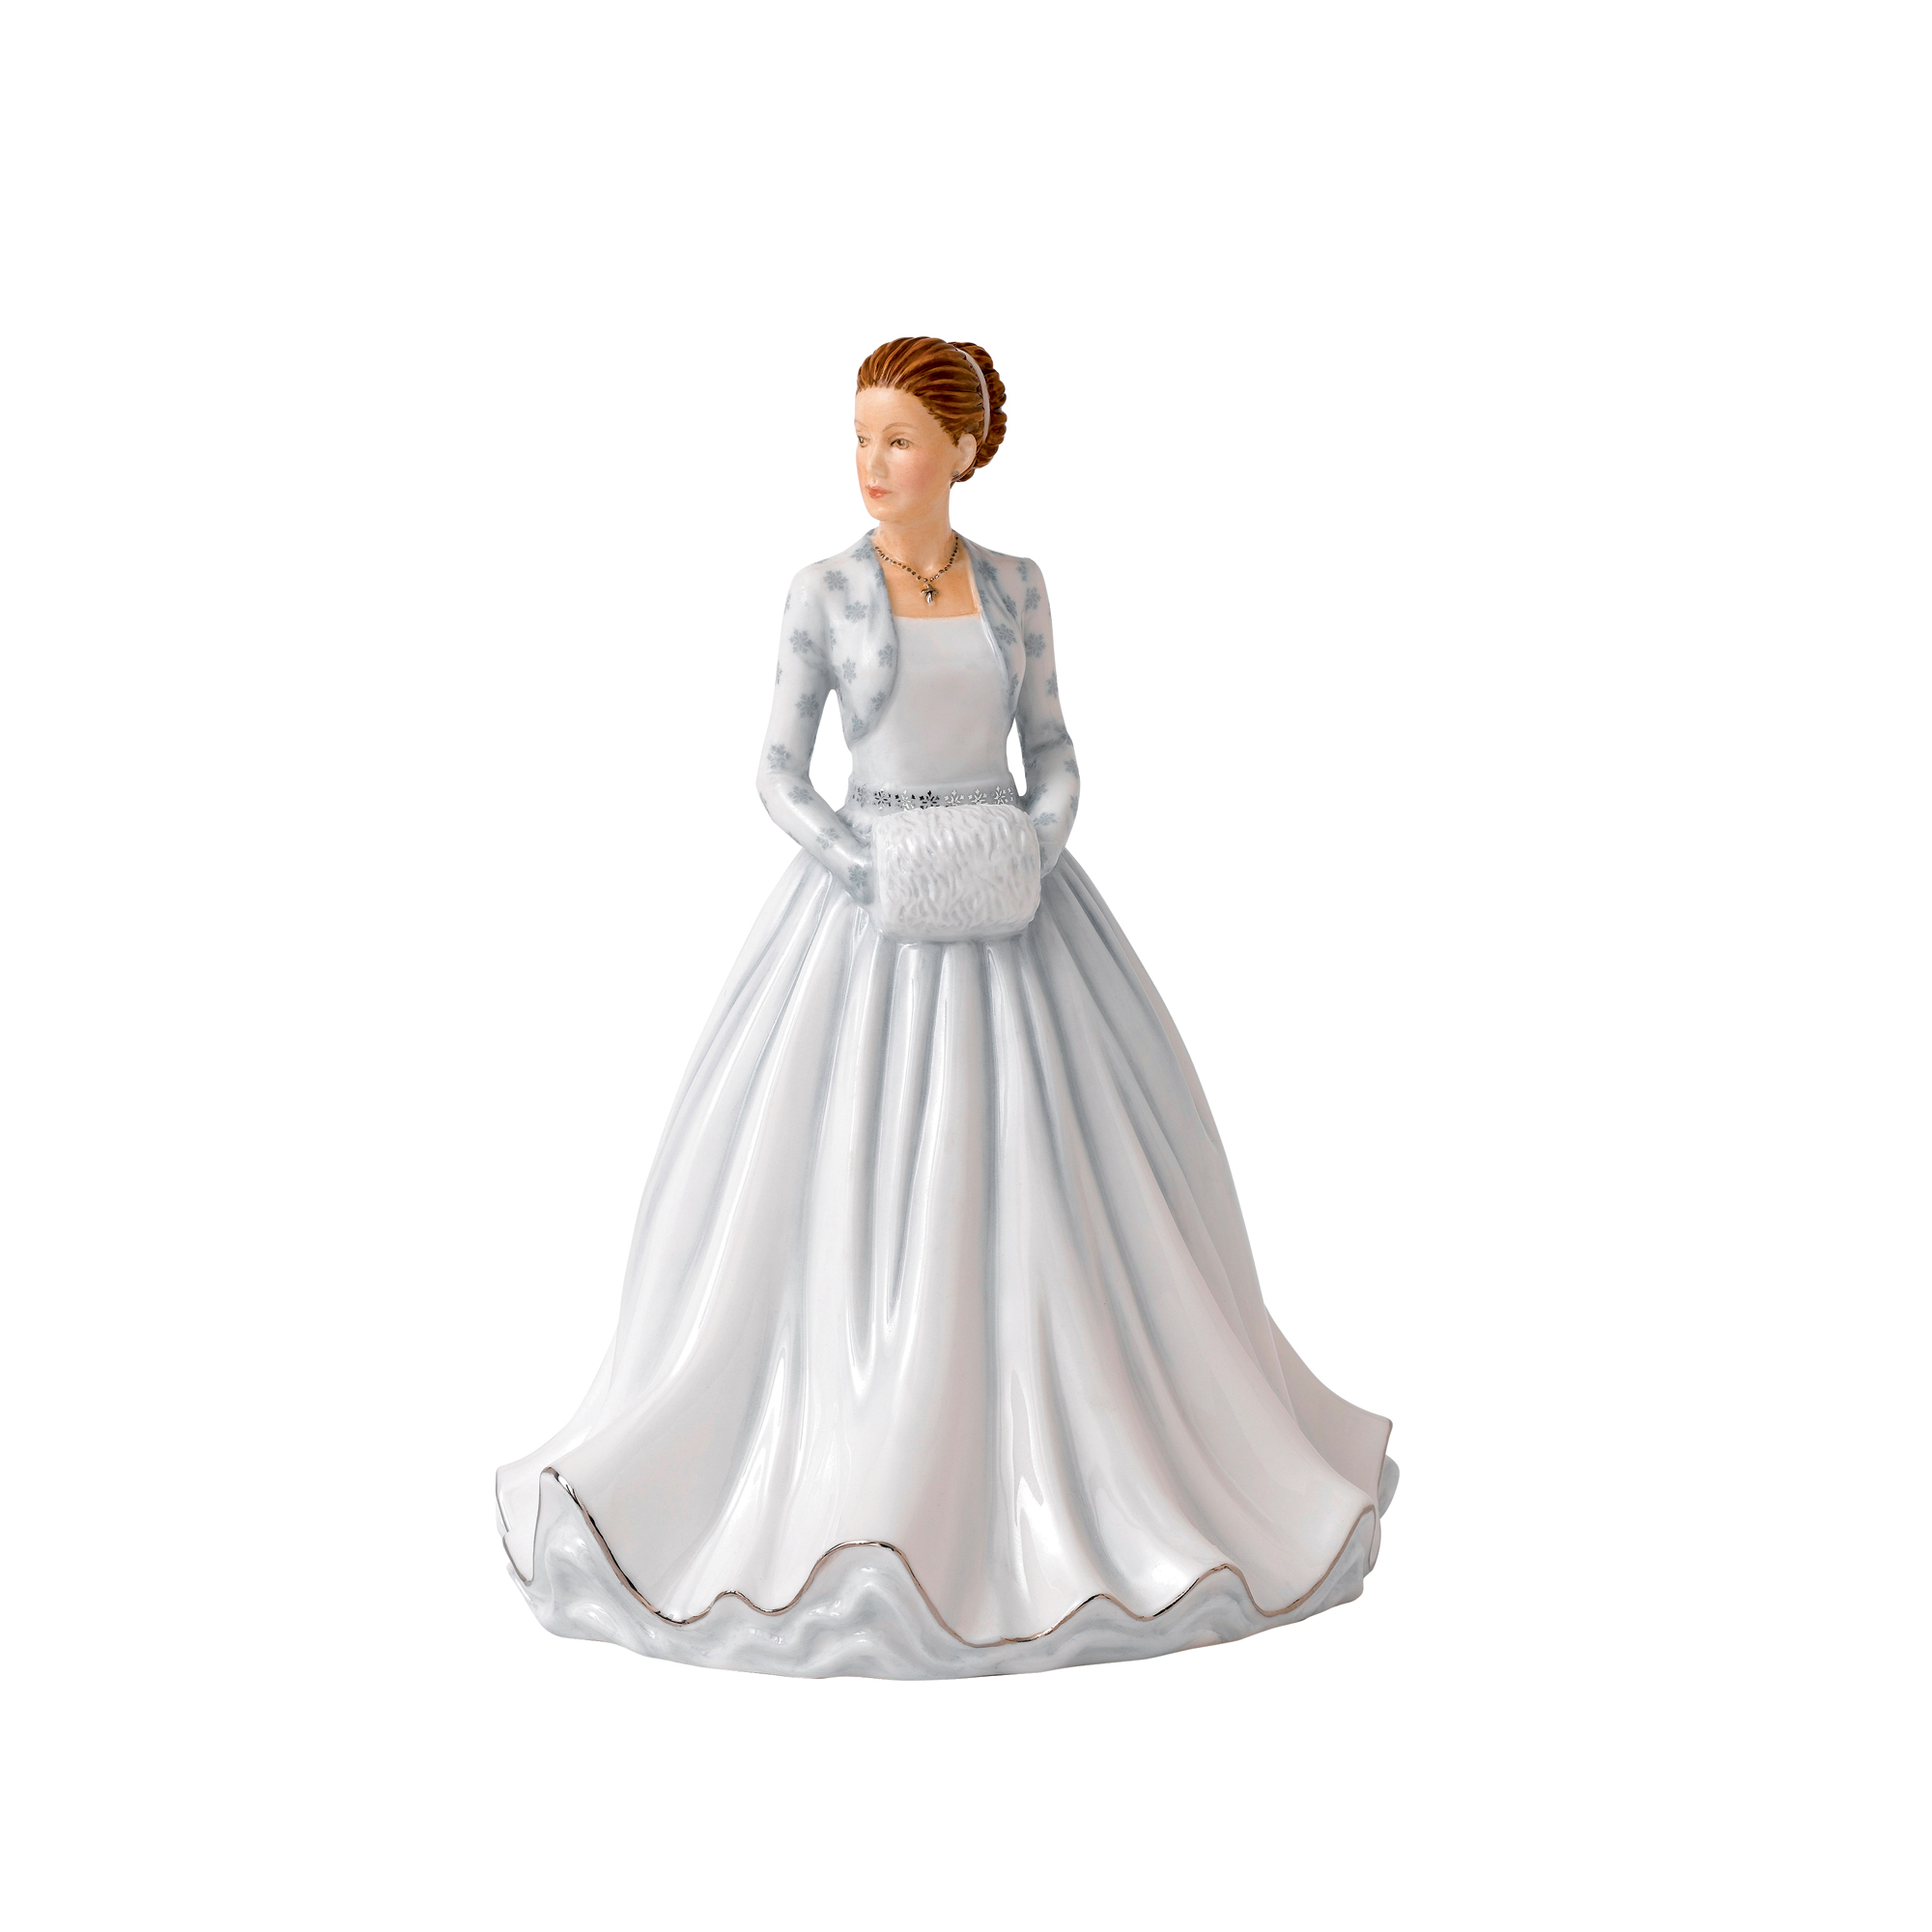 First Noel HN5757 - Royal Doulton Figurine